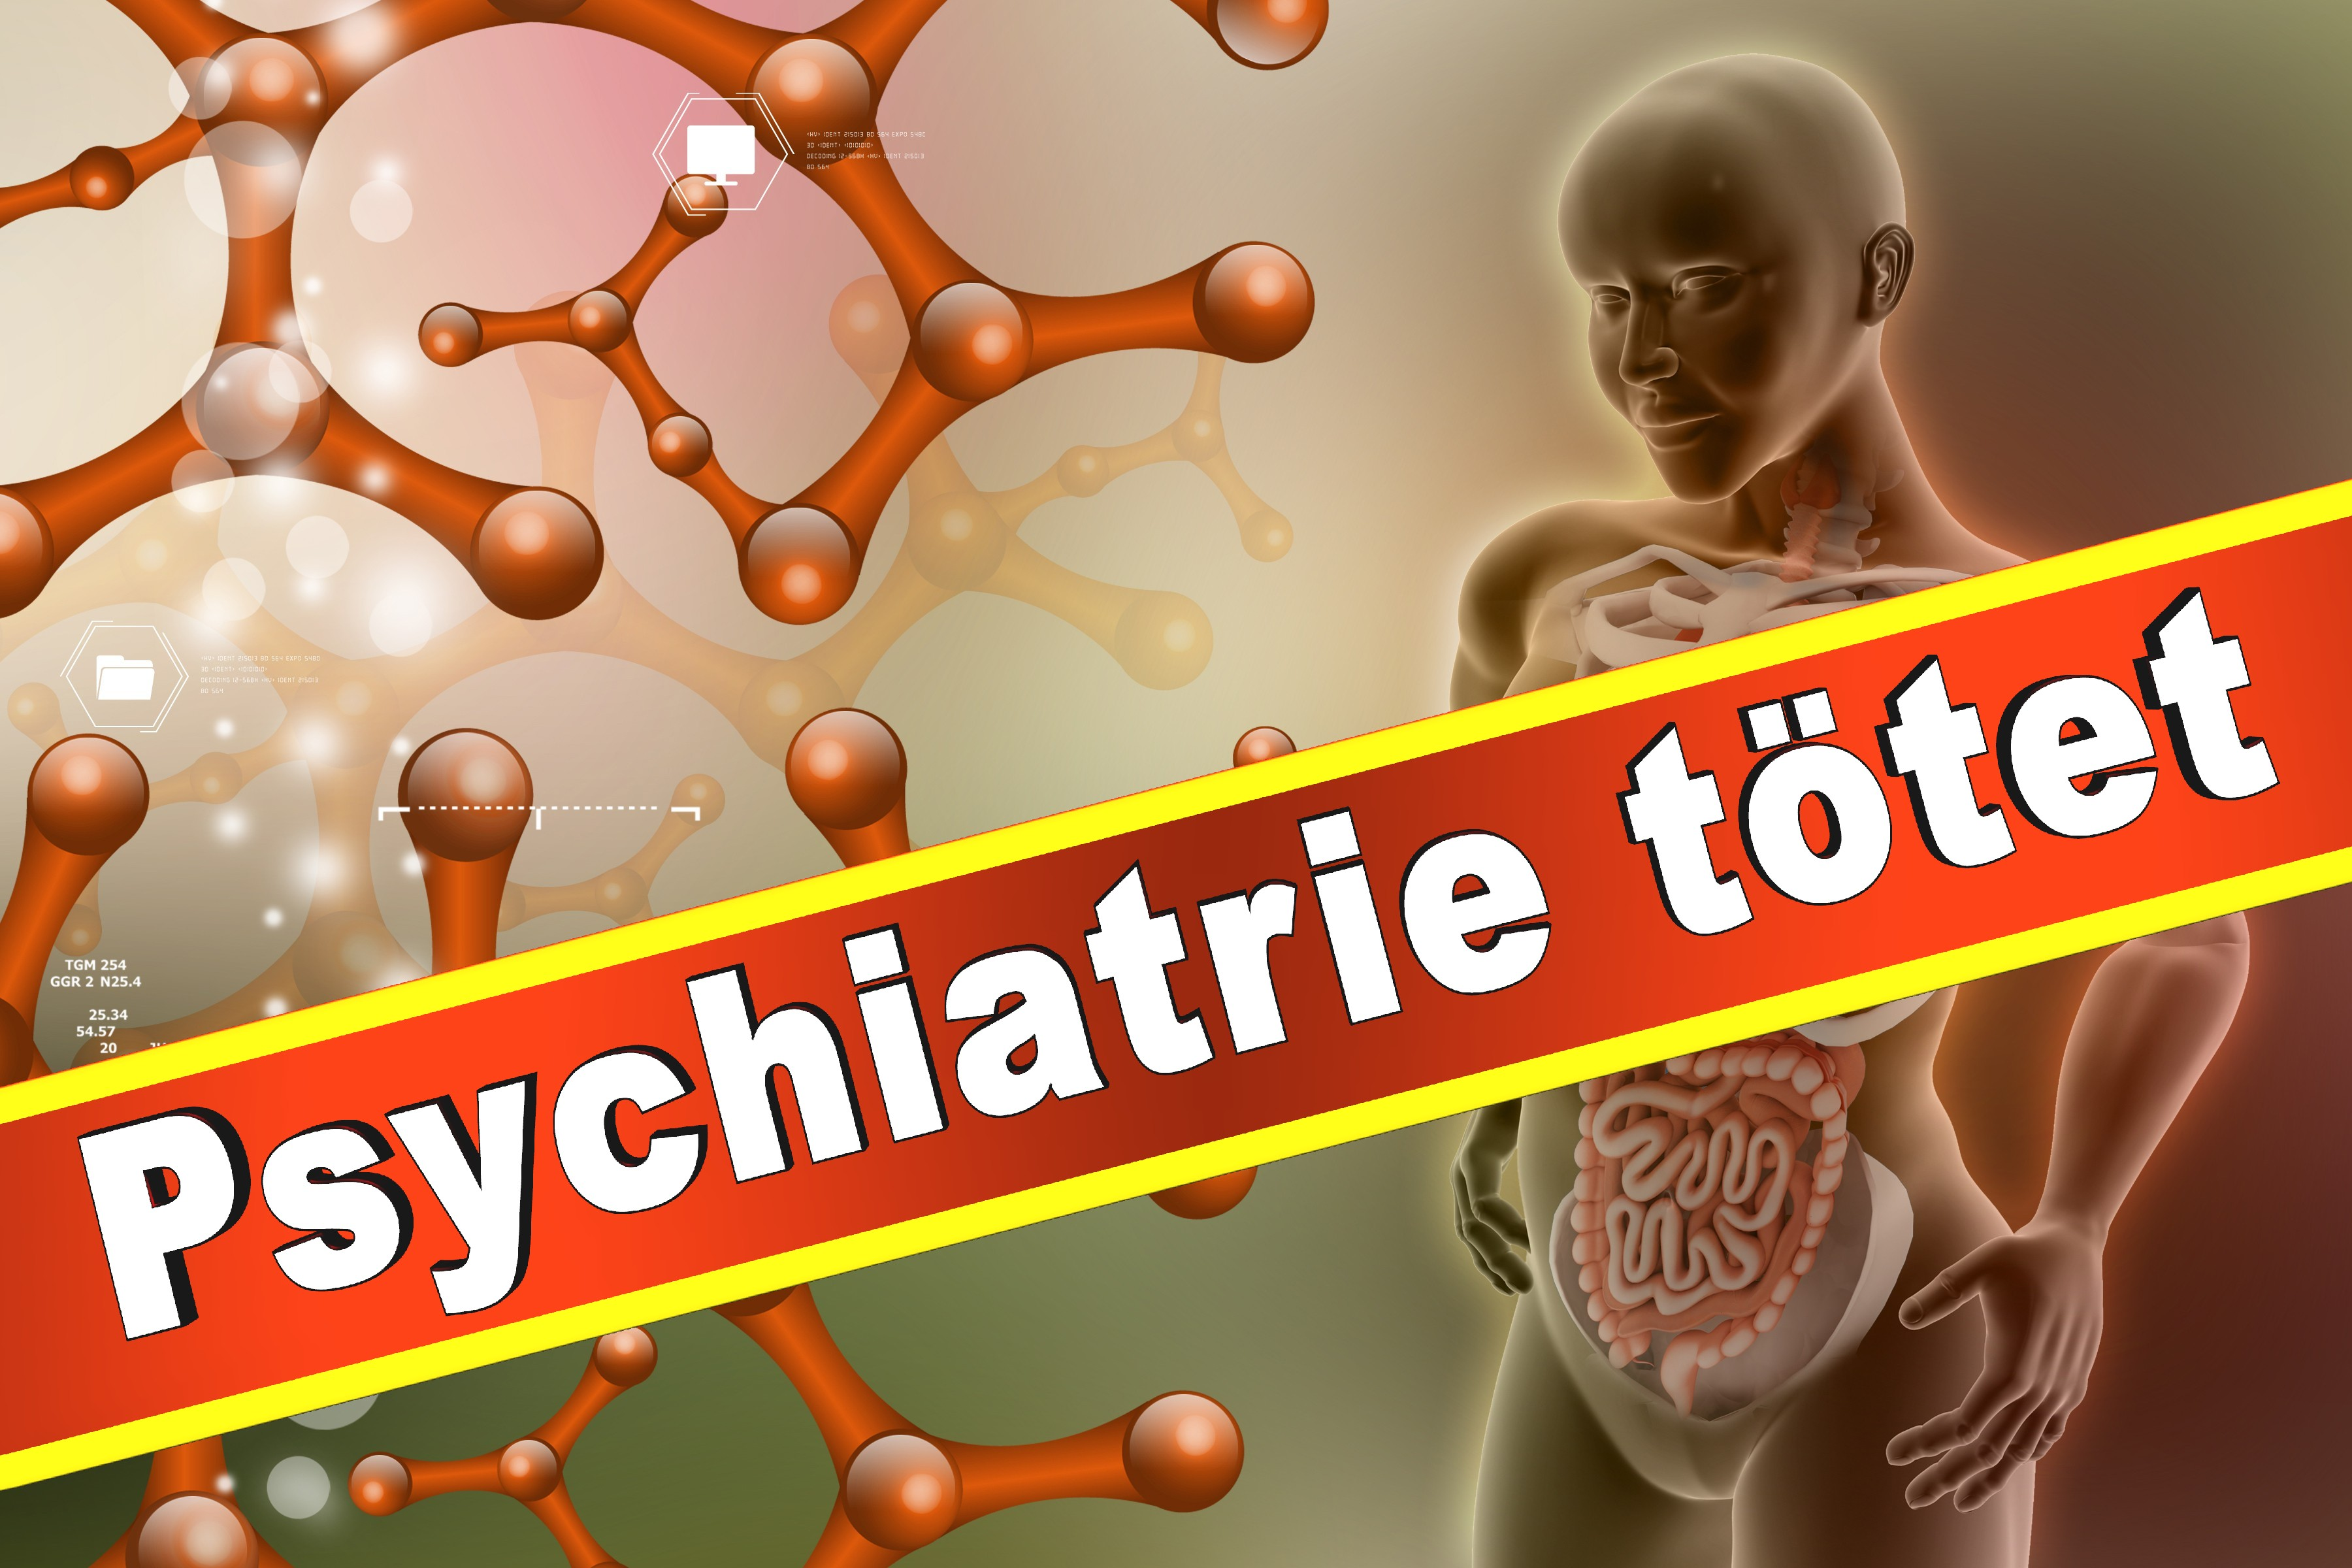 Claudia Klemm Neurologe Hannover Gutachten Psychiater Facharzt Psychiatrie